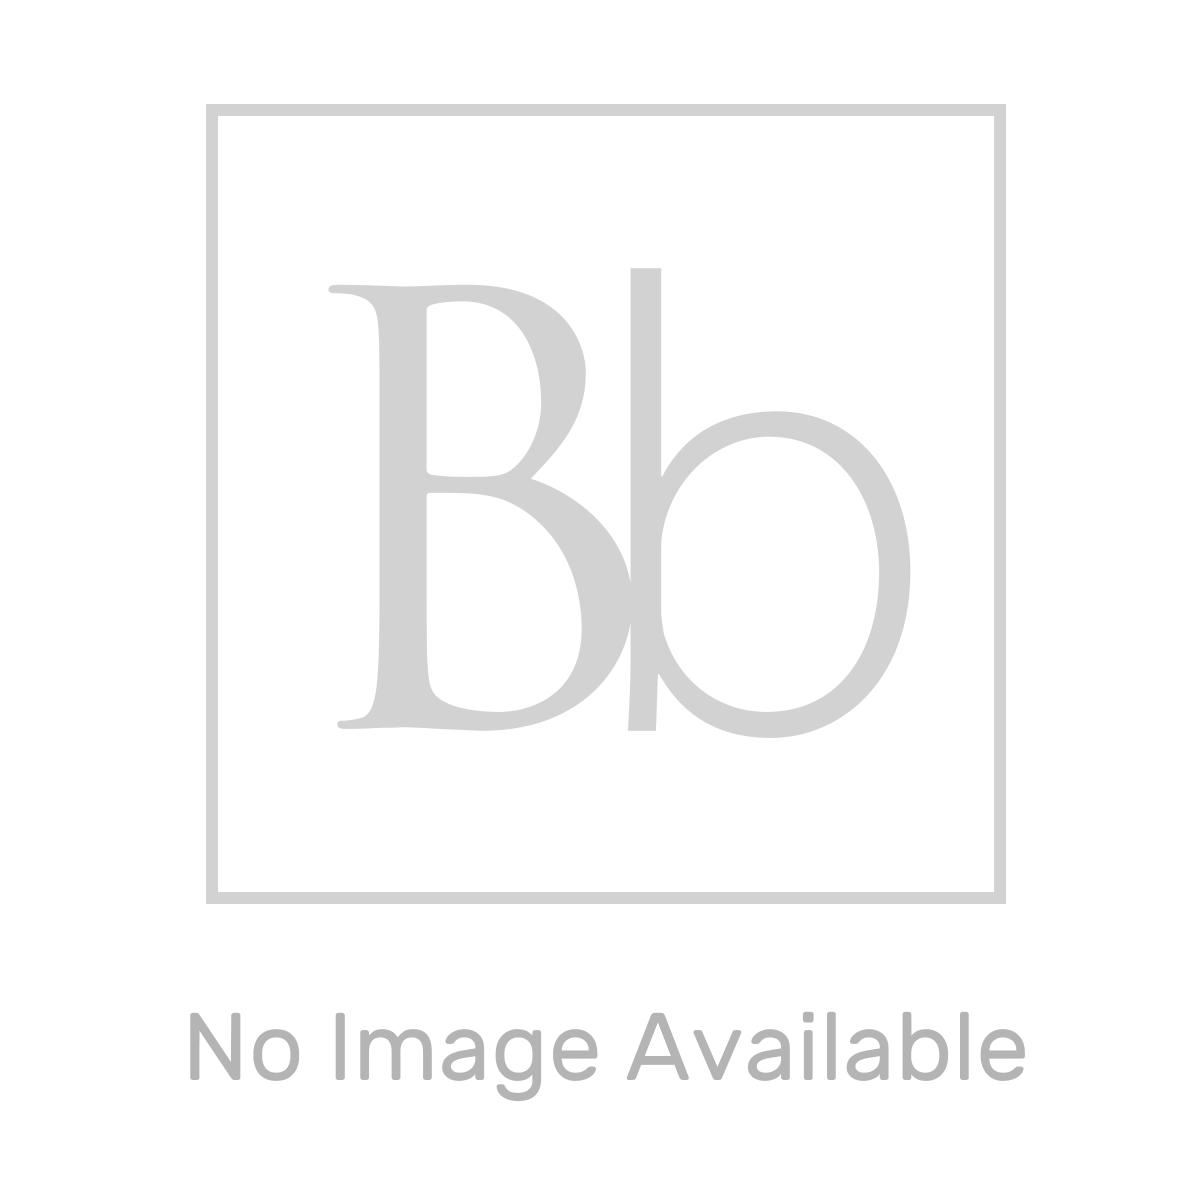 BTL Morina White Gloss Countertop 600mm